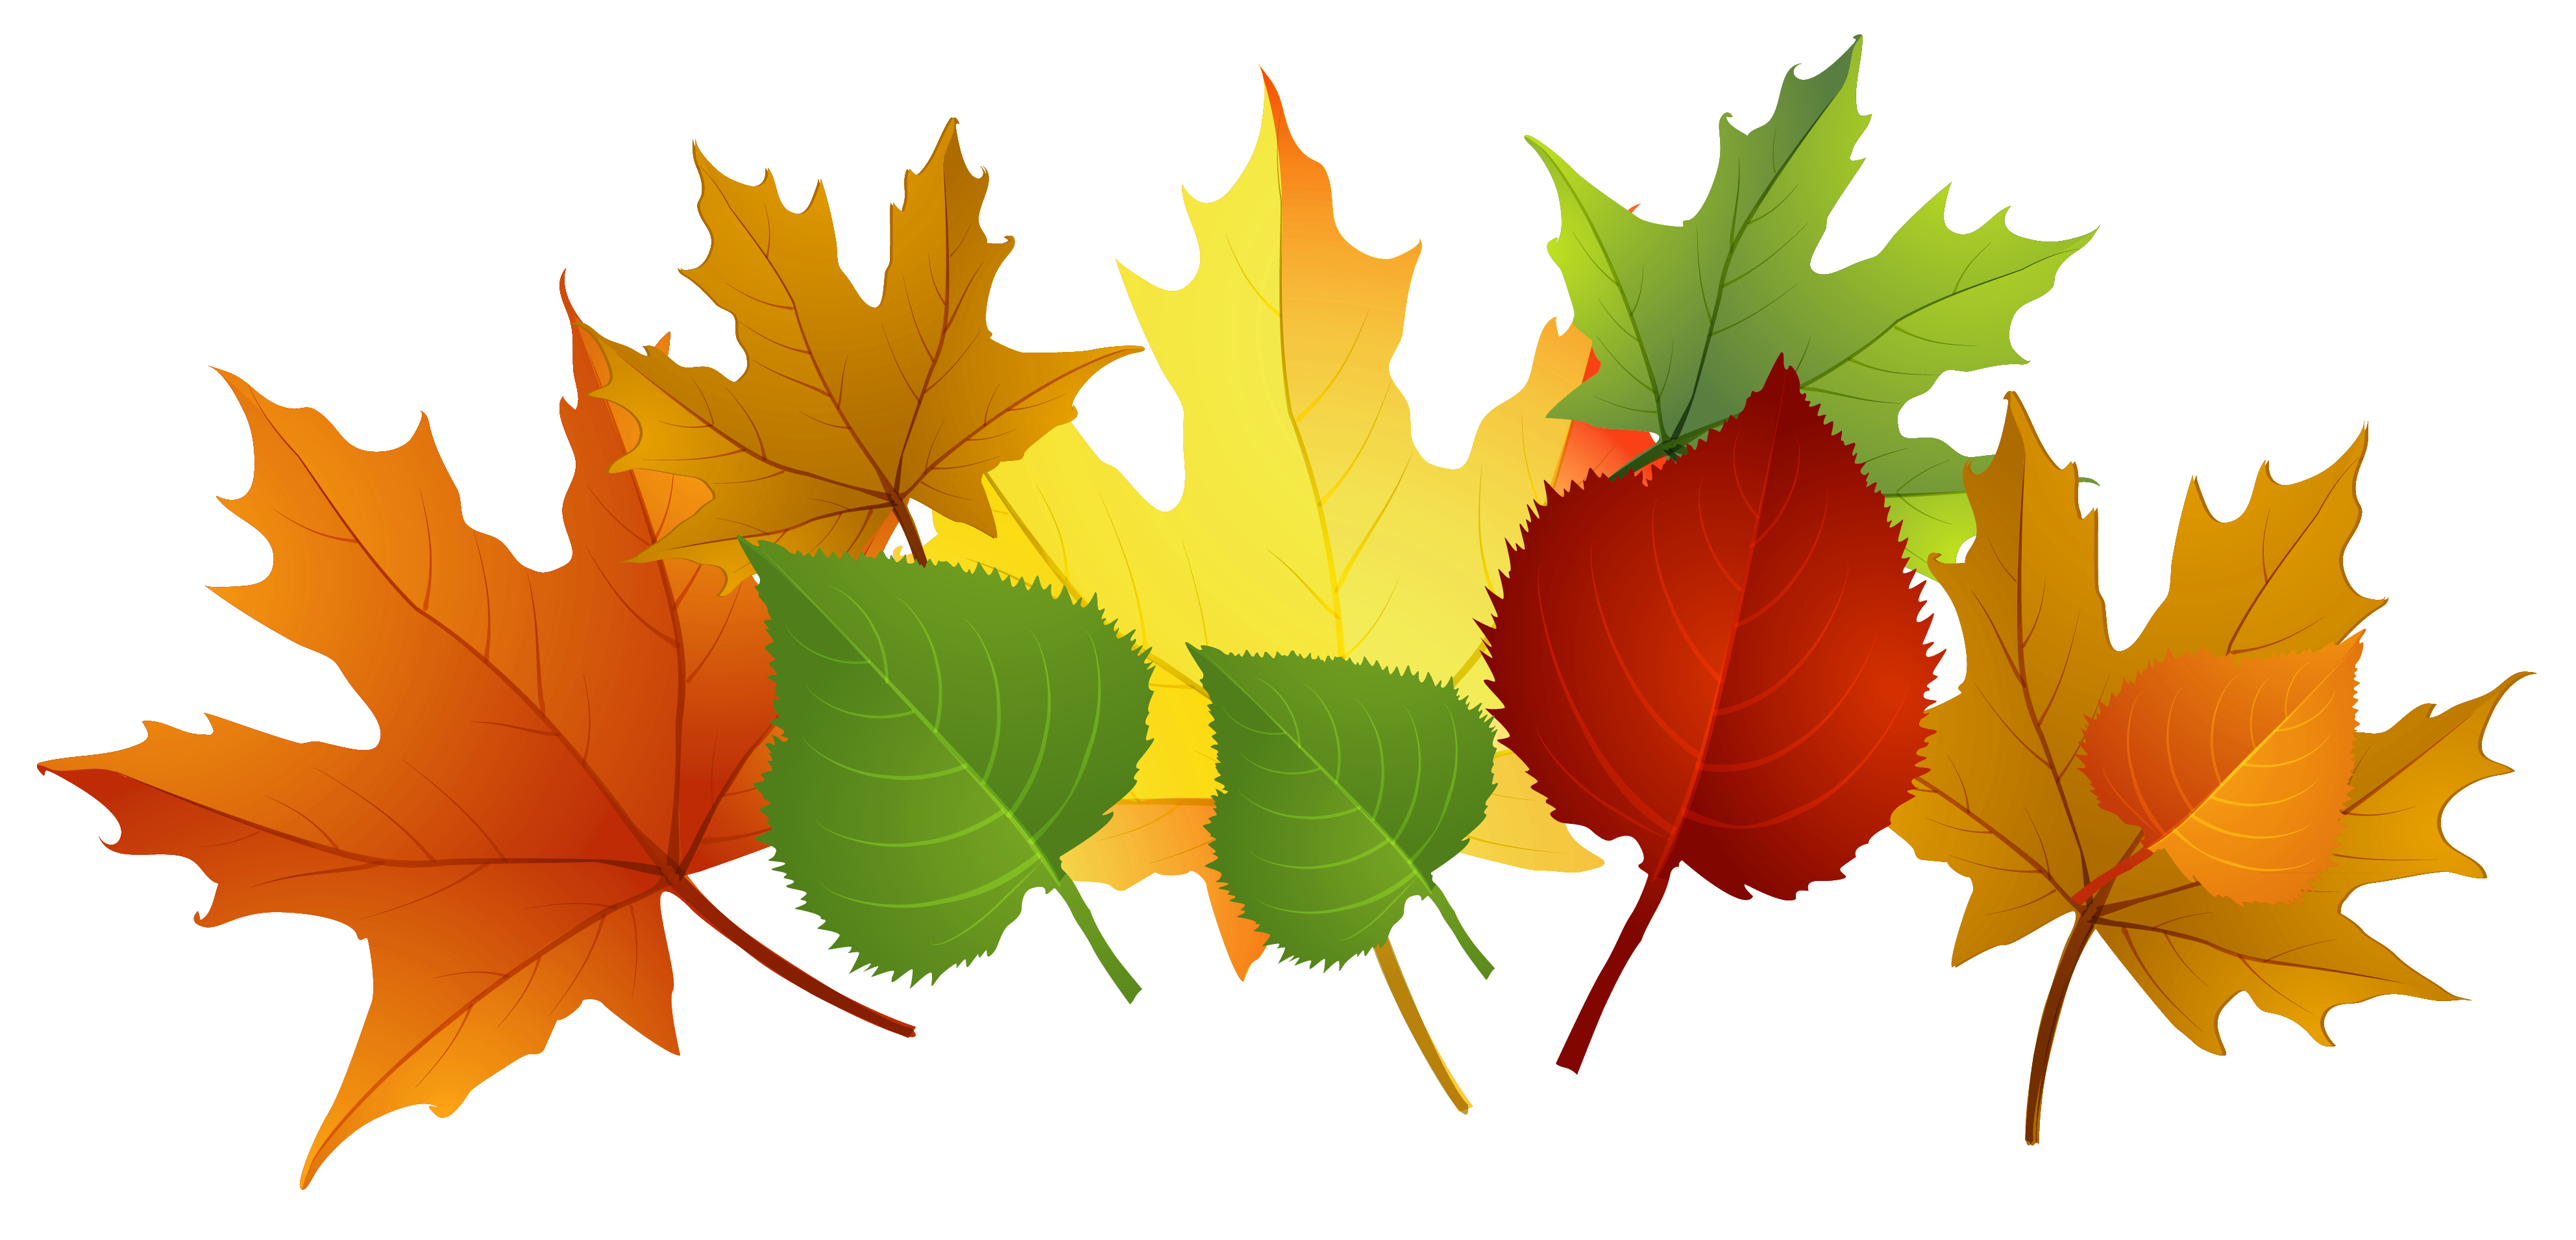 Google images leaves clipart banner transparent download Leaf Clip Art & Leaf Clip Art Clip Art Images - ClipartALL.com banner transparent download